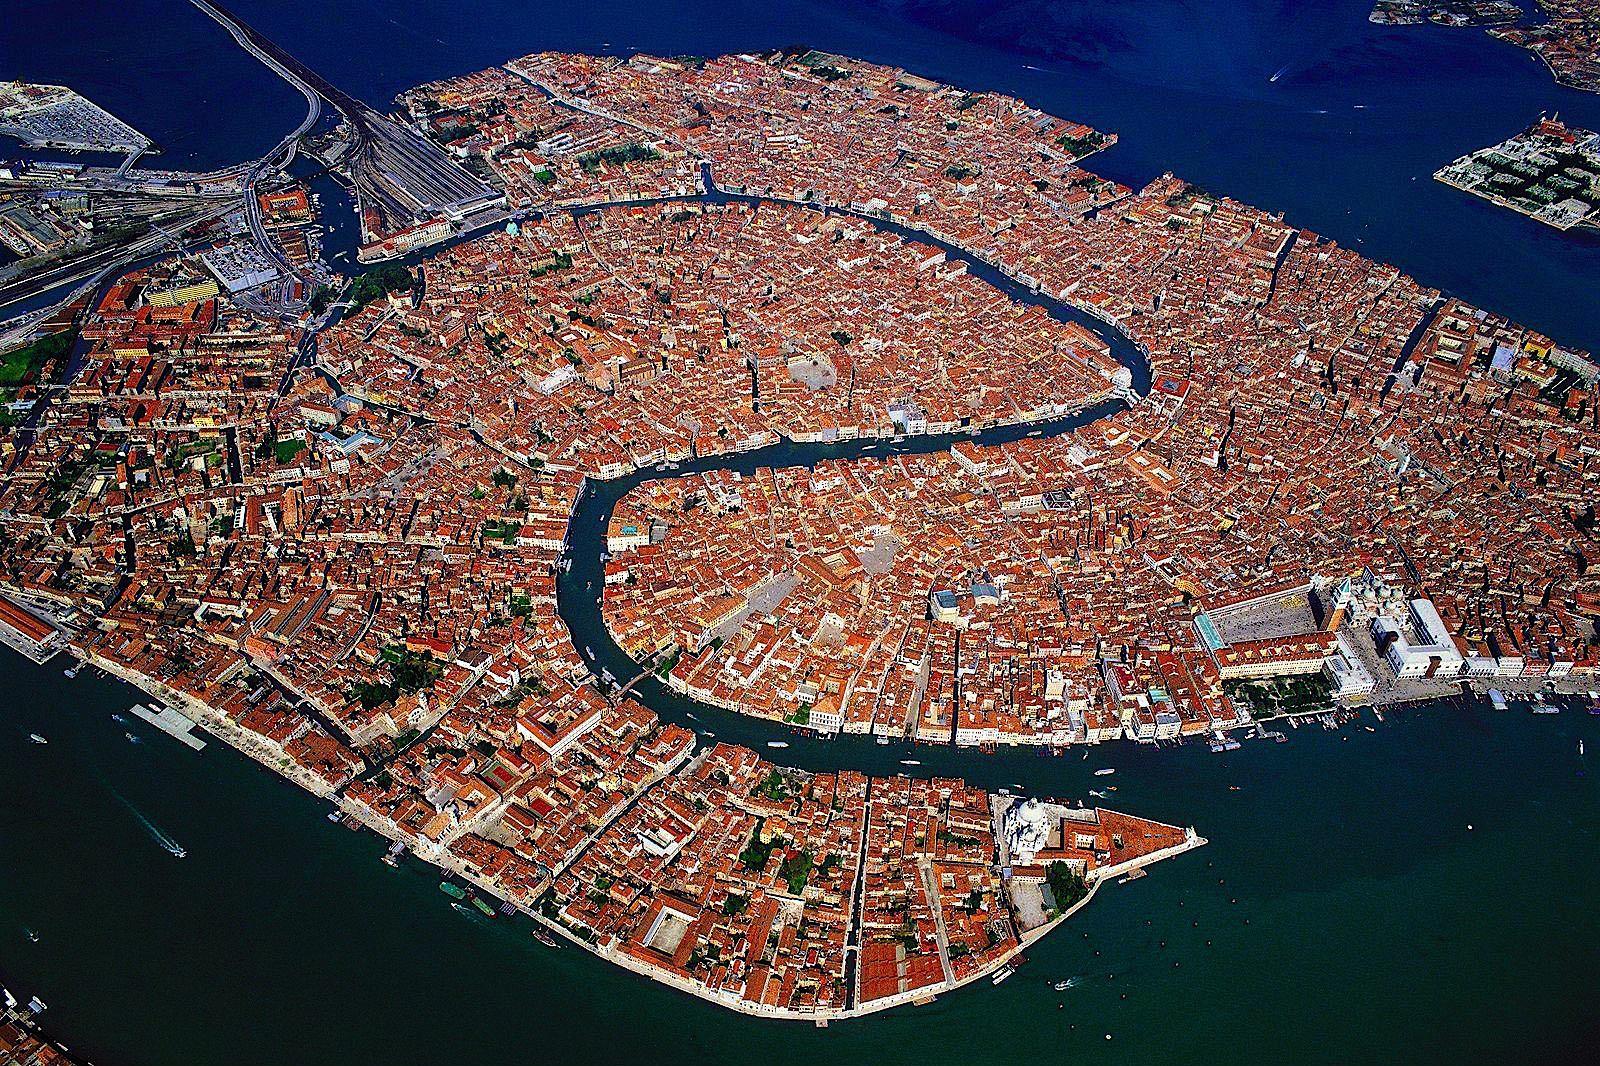 Venecia http://t.co/qiWpQdubXX